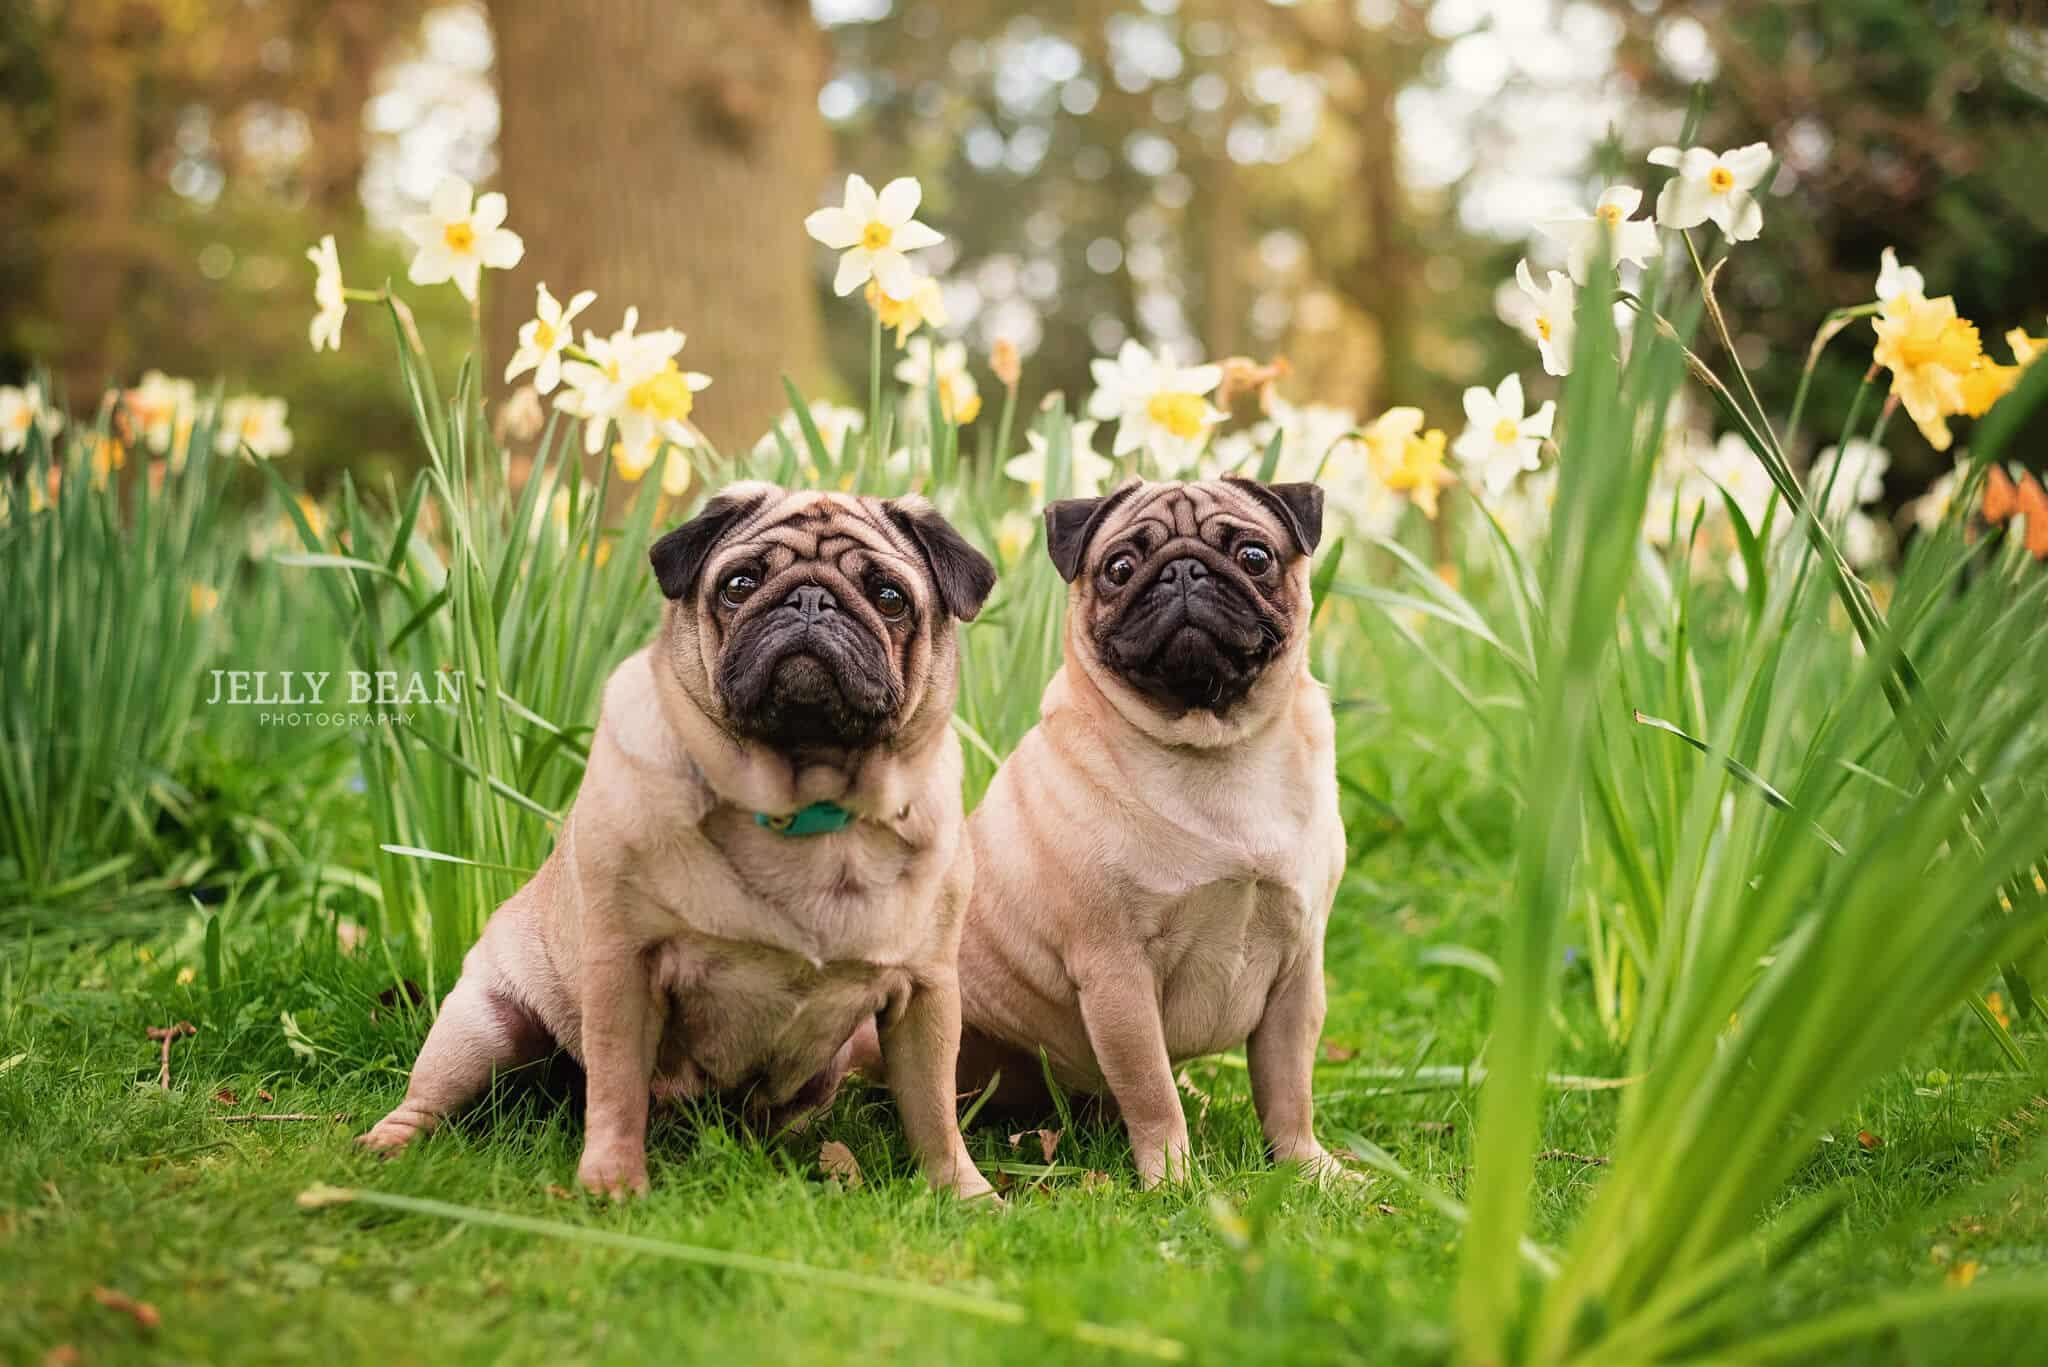 Two pugs in daffodils